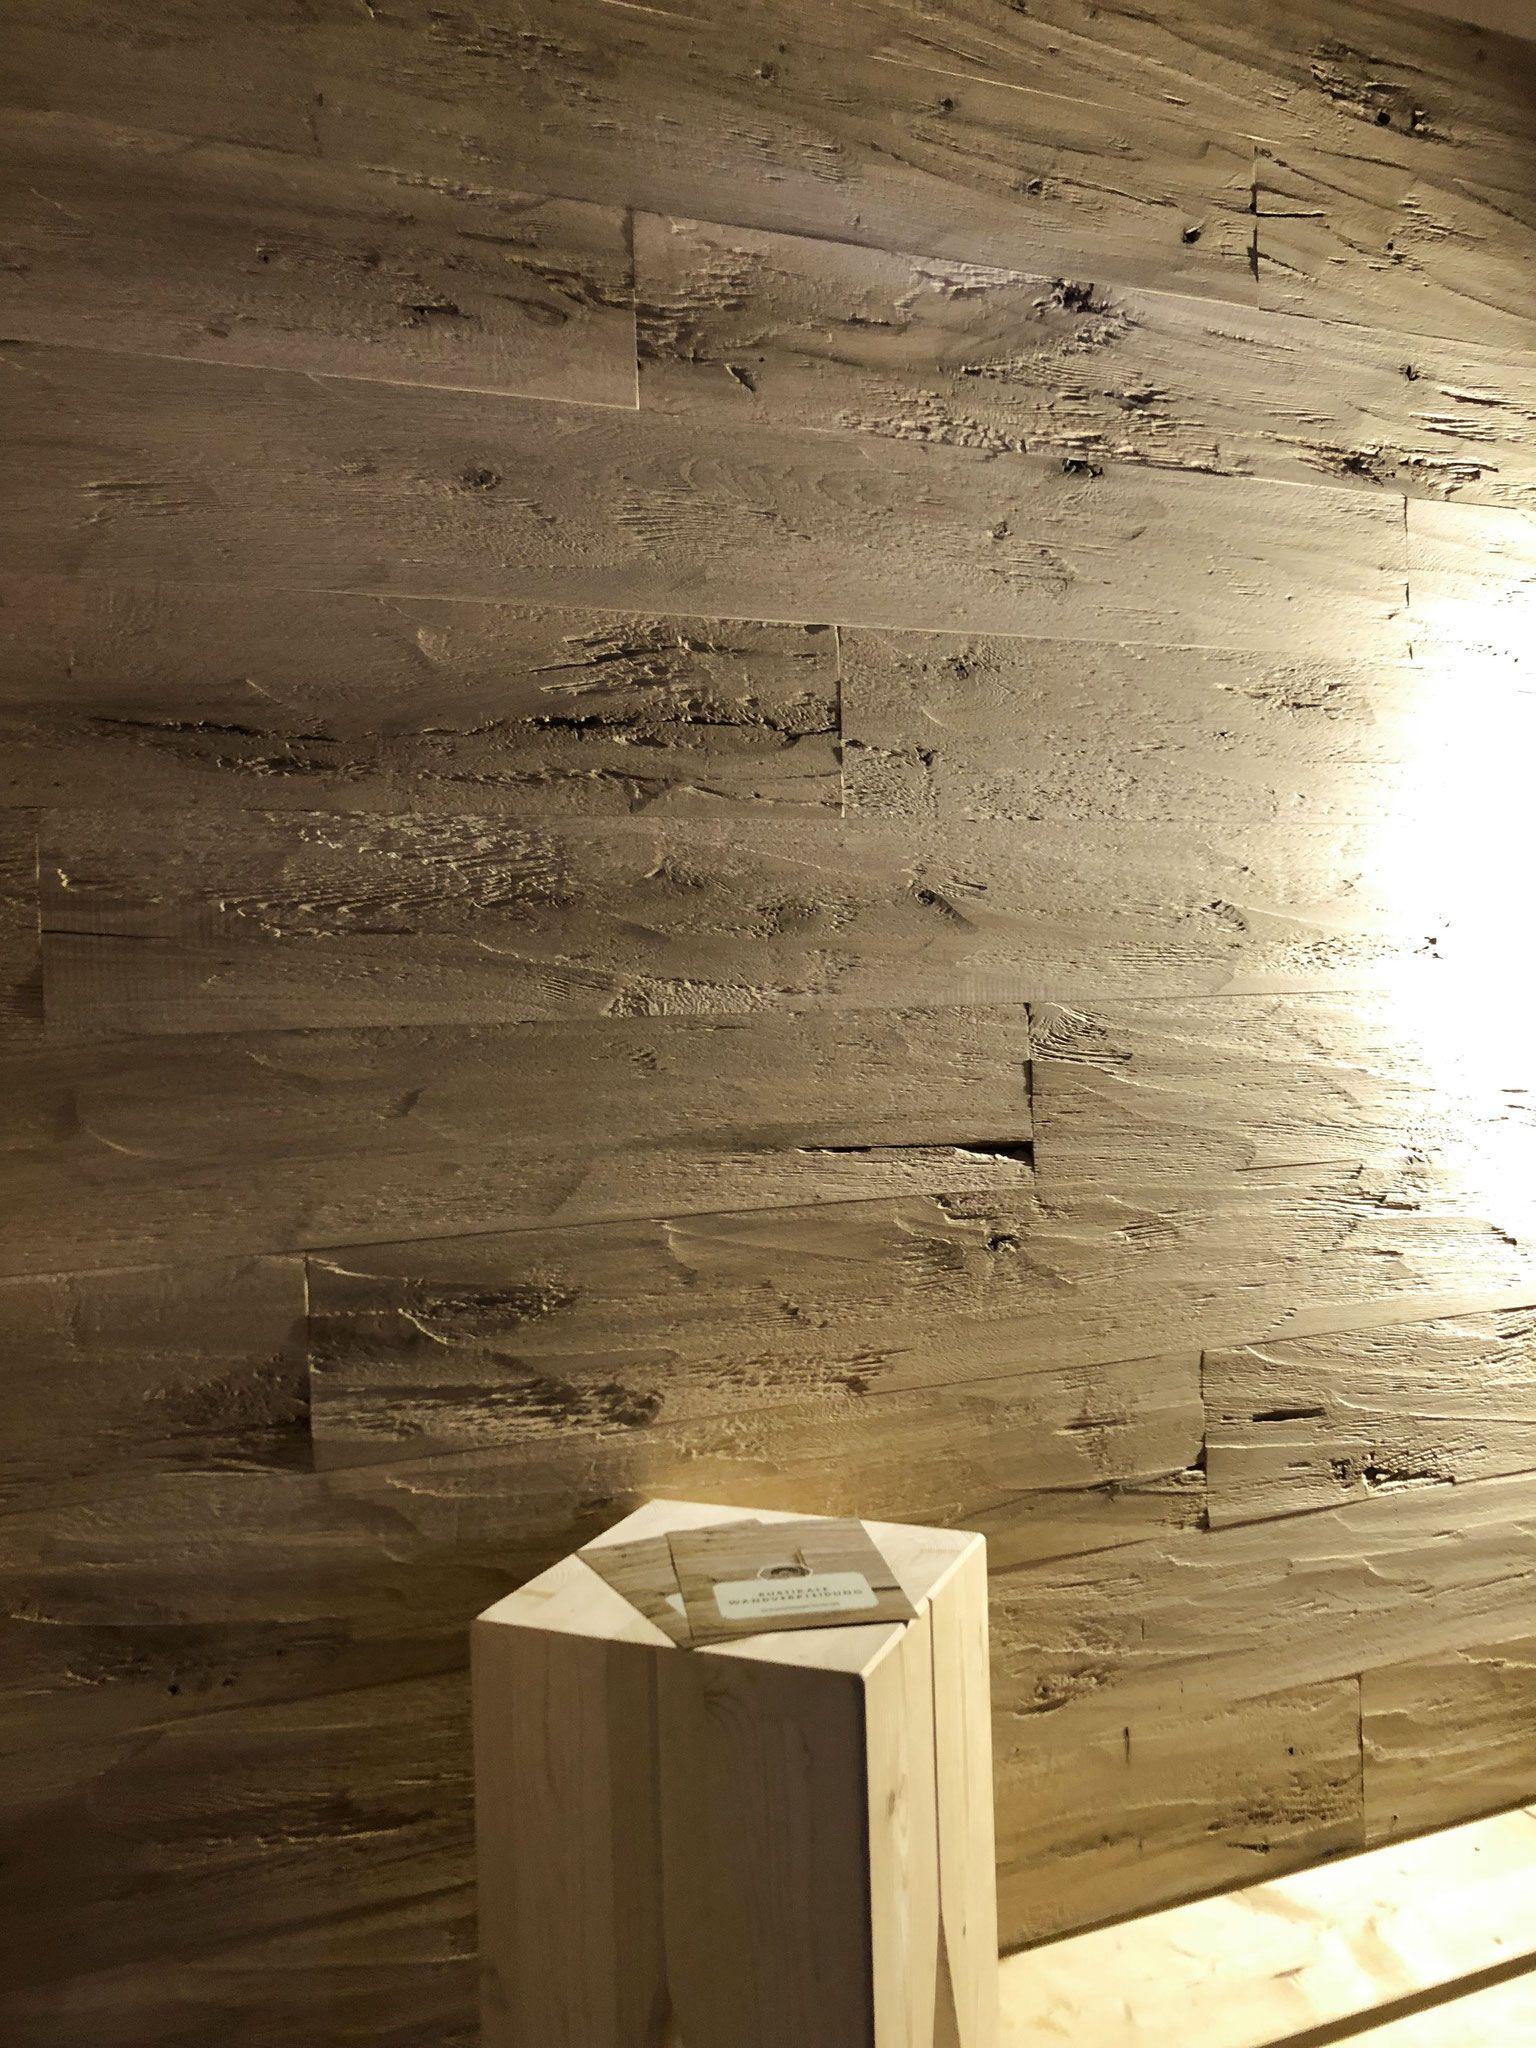 Rustikale Wandverkleidung Fichte Gedampft Gehackt Geburstet Vintage Holz Altholz Wandverkleidung Wandverkleidung Vintage Holz